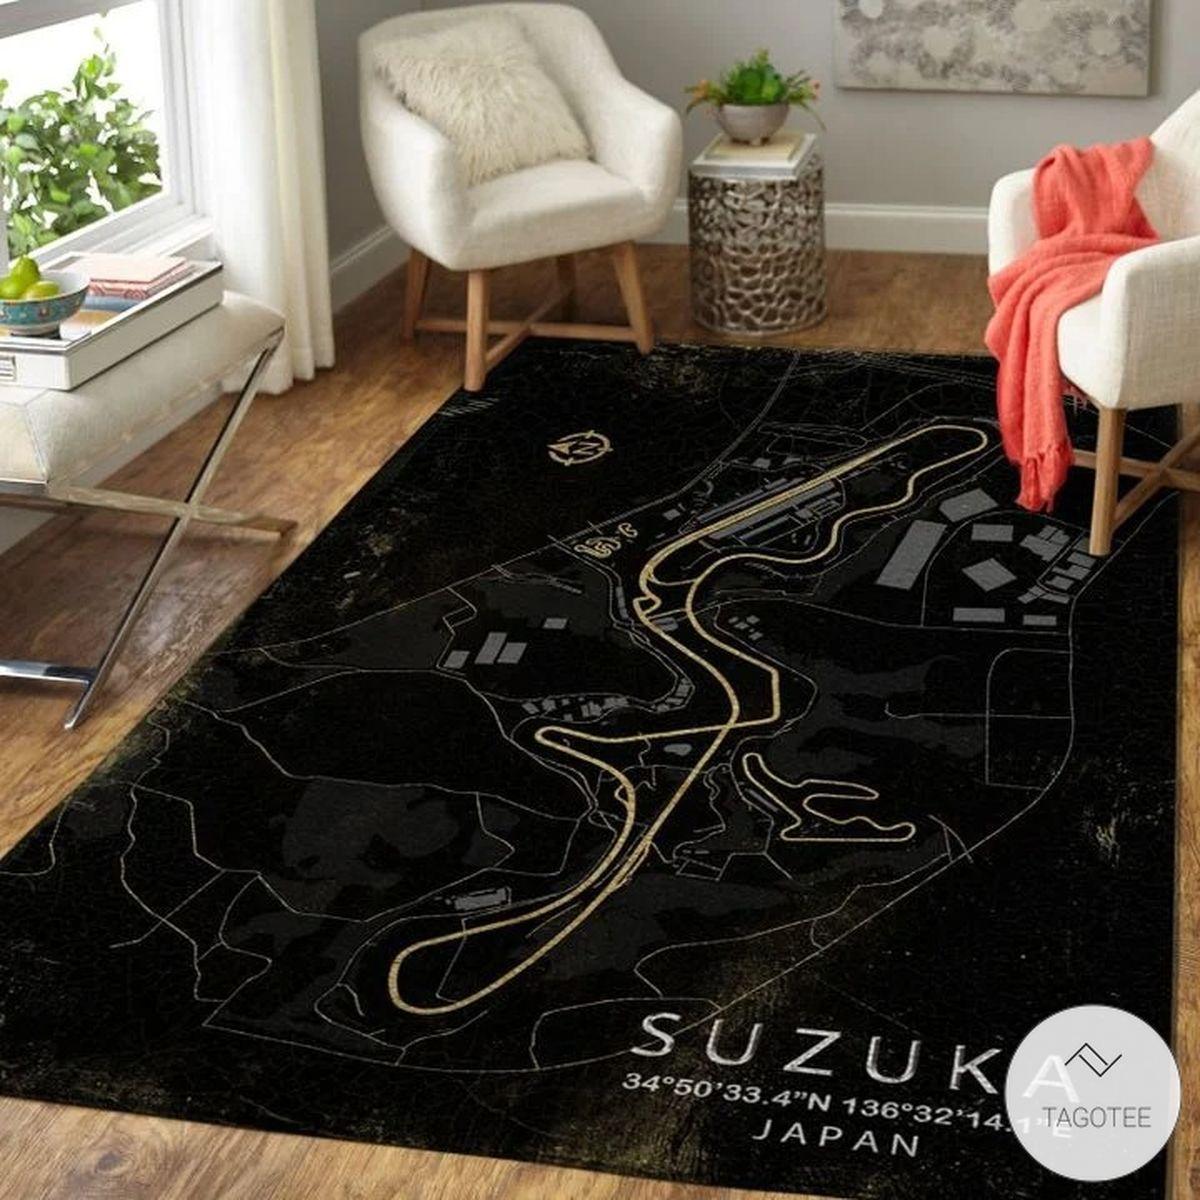 Suzuka Japan F1 Circuit Map Rugz